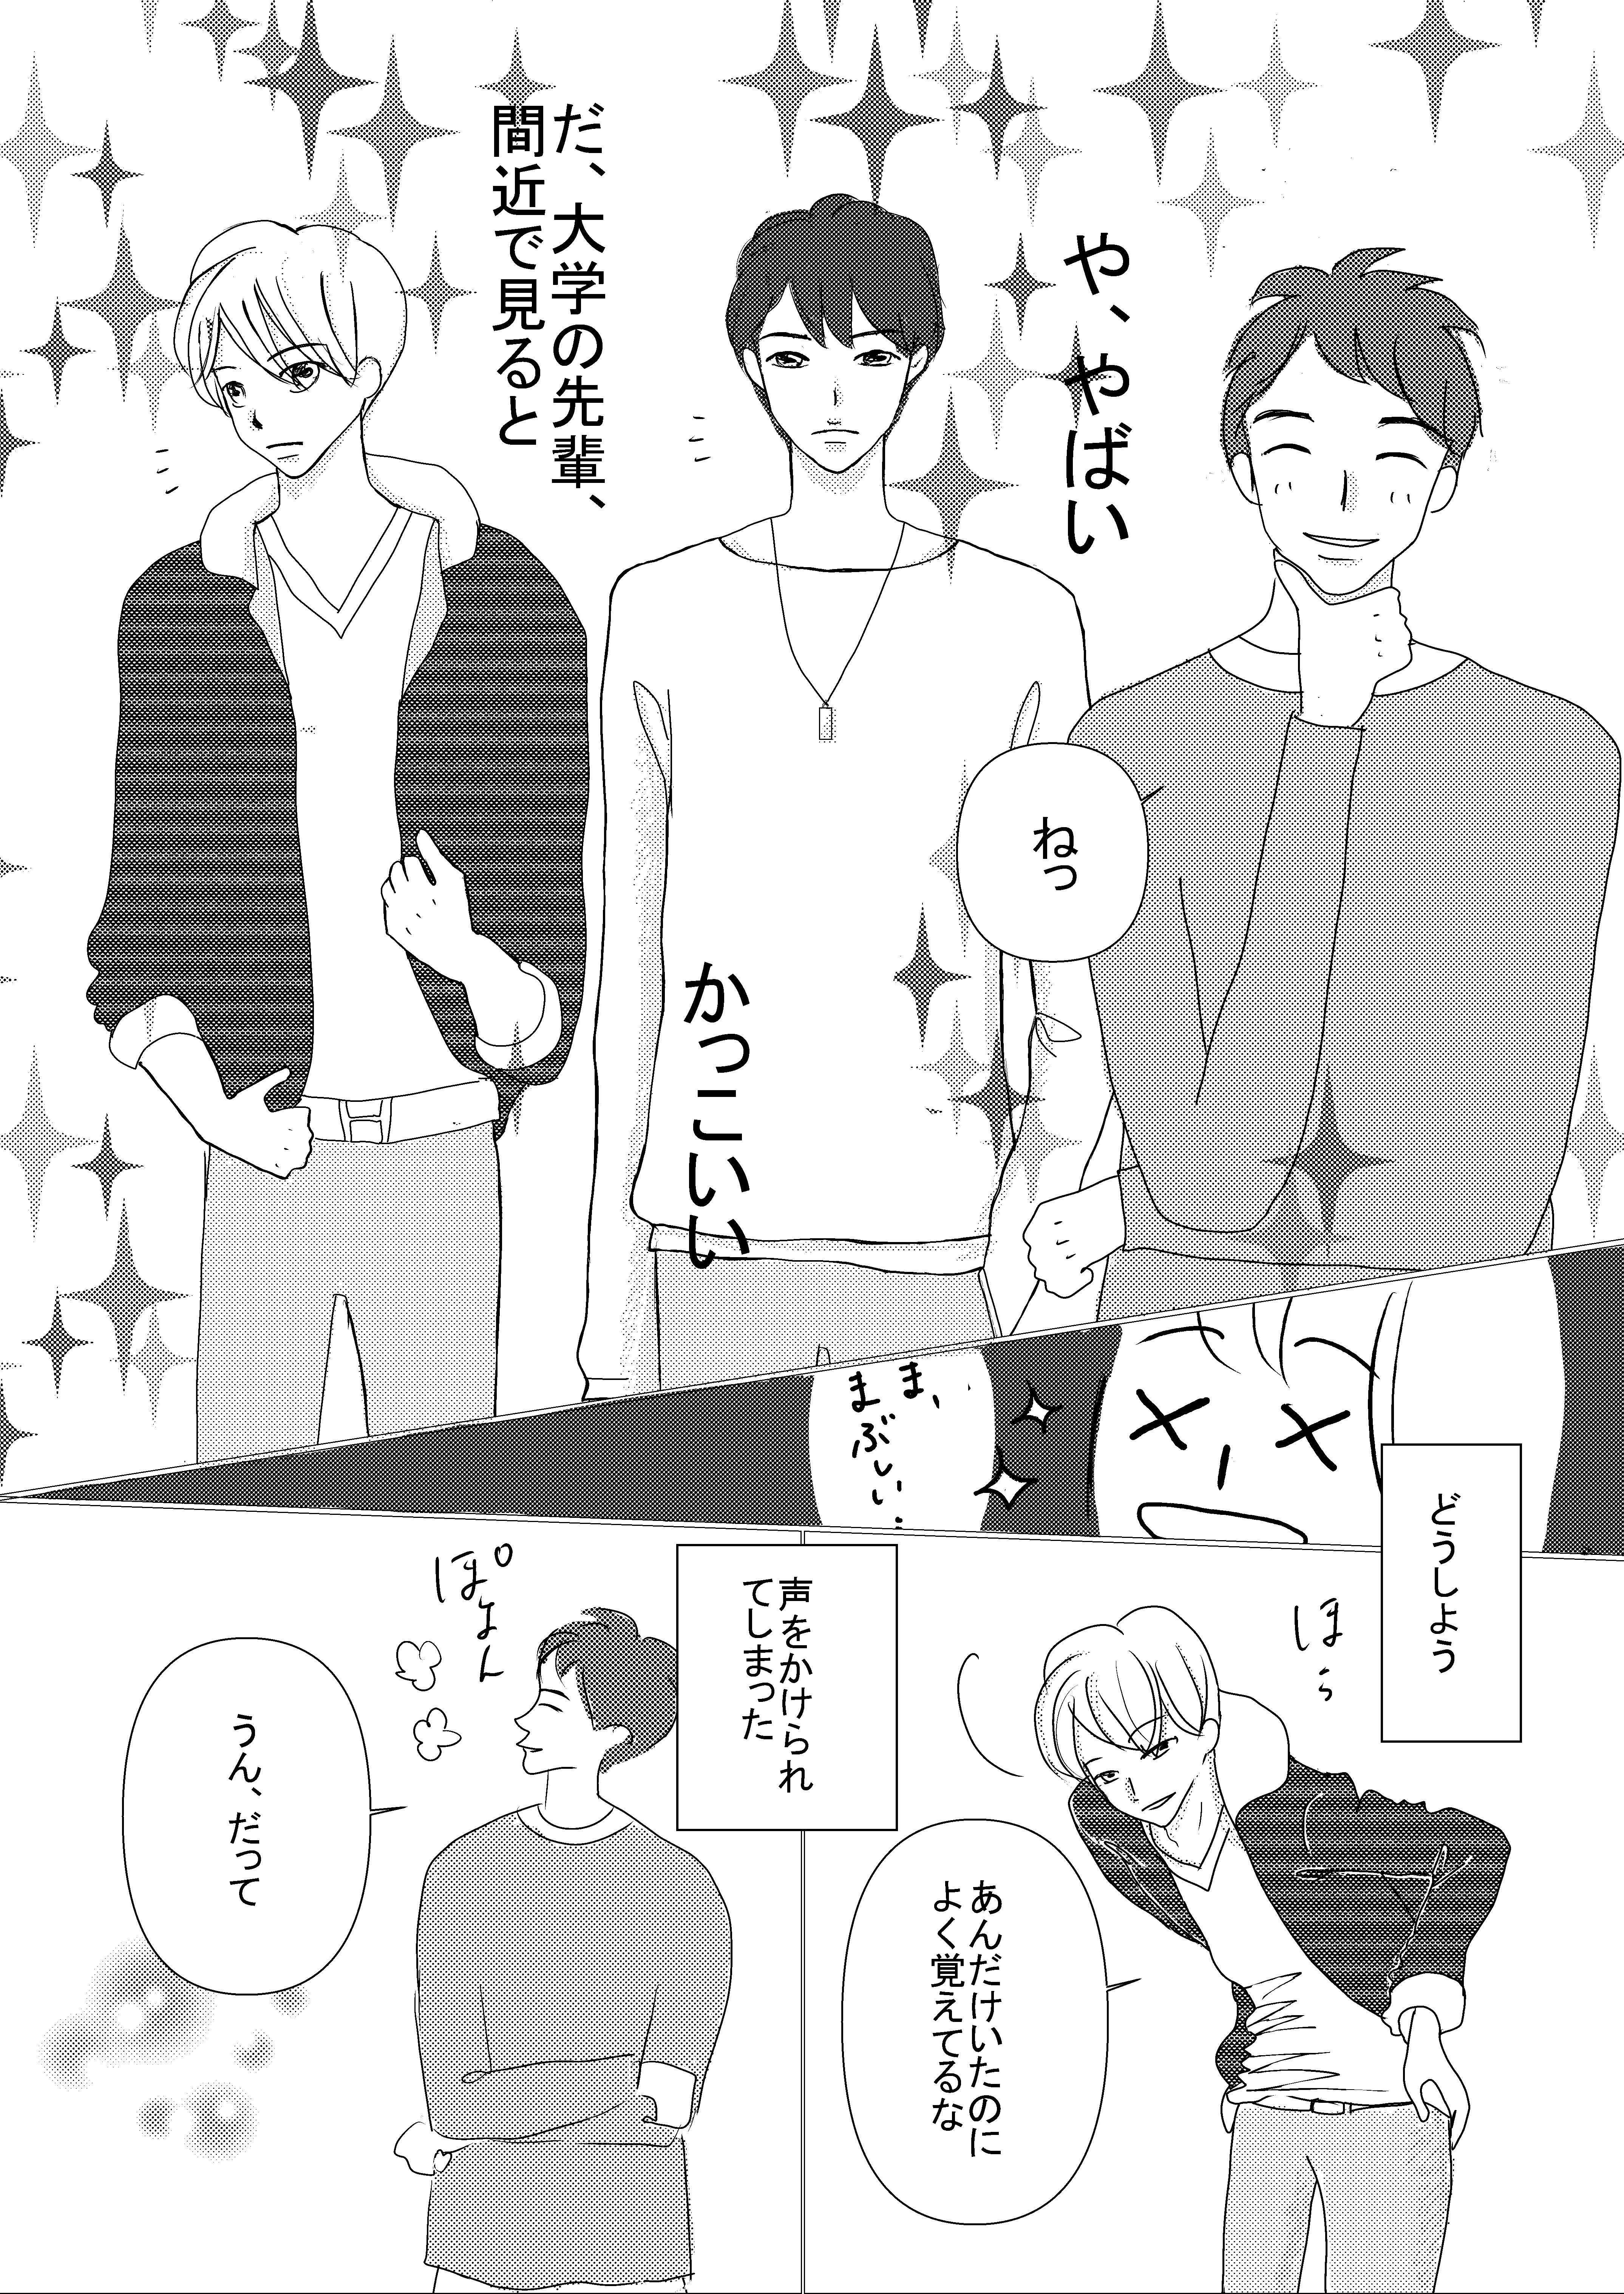 恋愛漫画/大学生/社会人/shoujyo manga/米加夢/7ページ